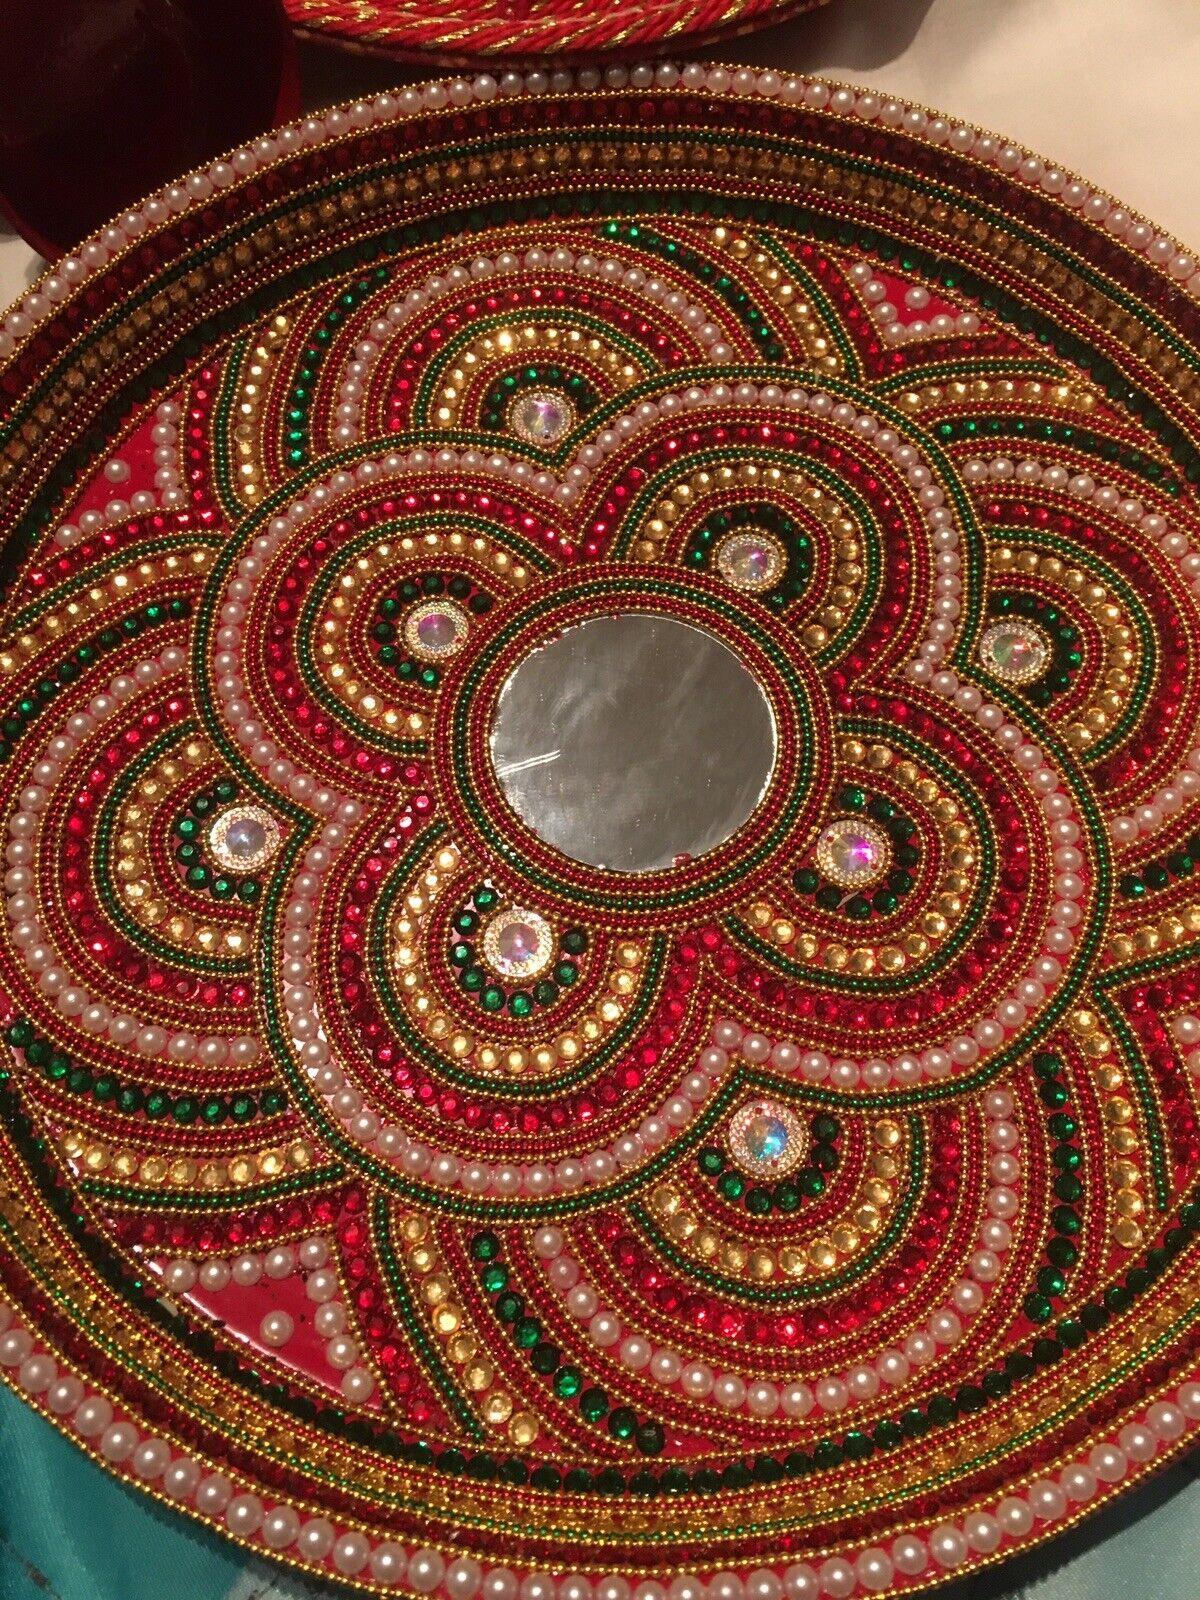 Indian Wedding plateaux - 4 Pooja Plateaux & 5 petits bols